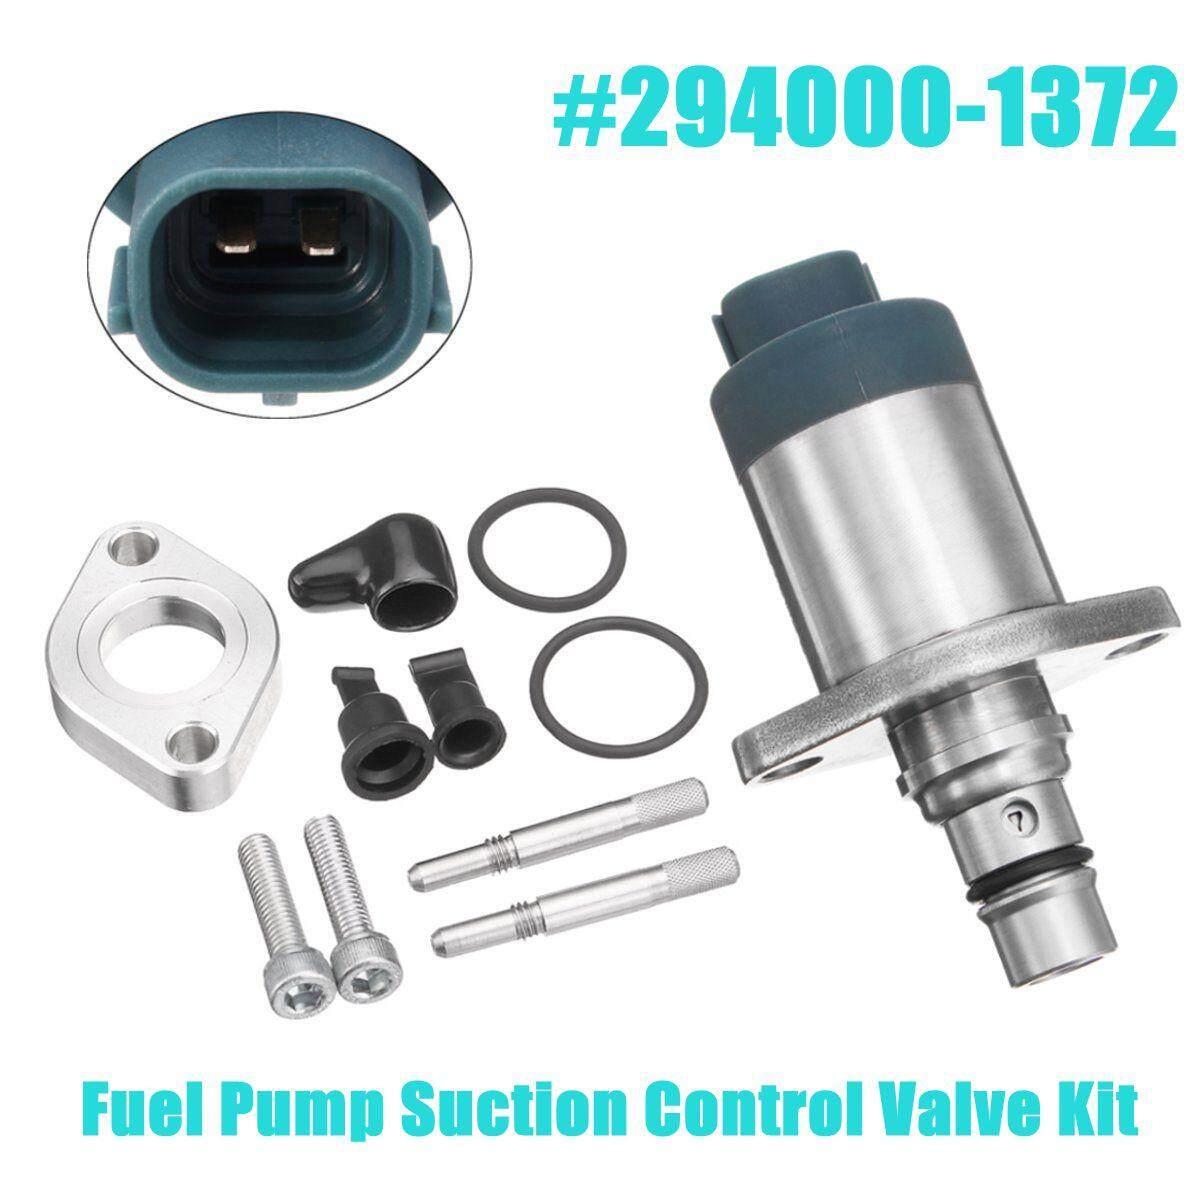 Fuel Gasket For Sale Car Pump Online Brands Prices Reviews Mr Filter Suction Control Valve Scv Kit Mitsubishi L200 Isuzu 294000 1372